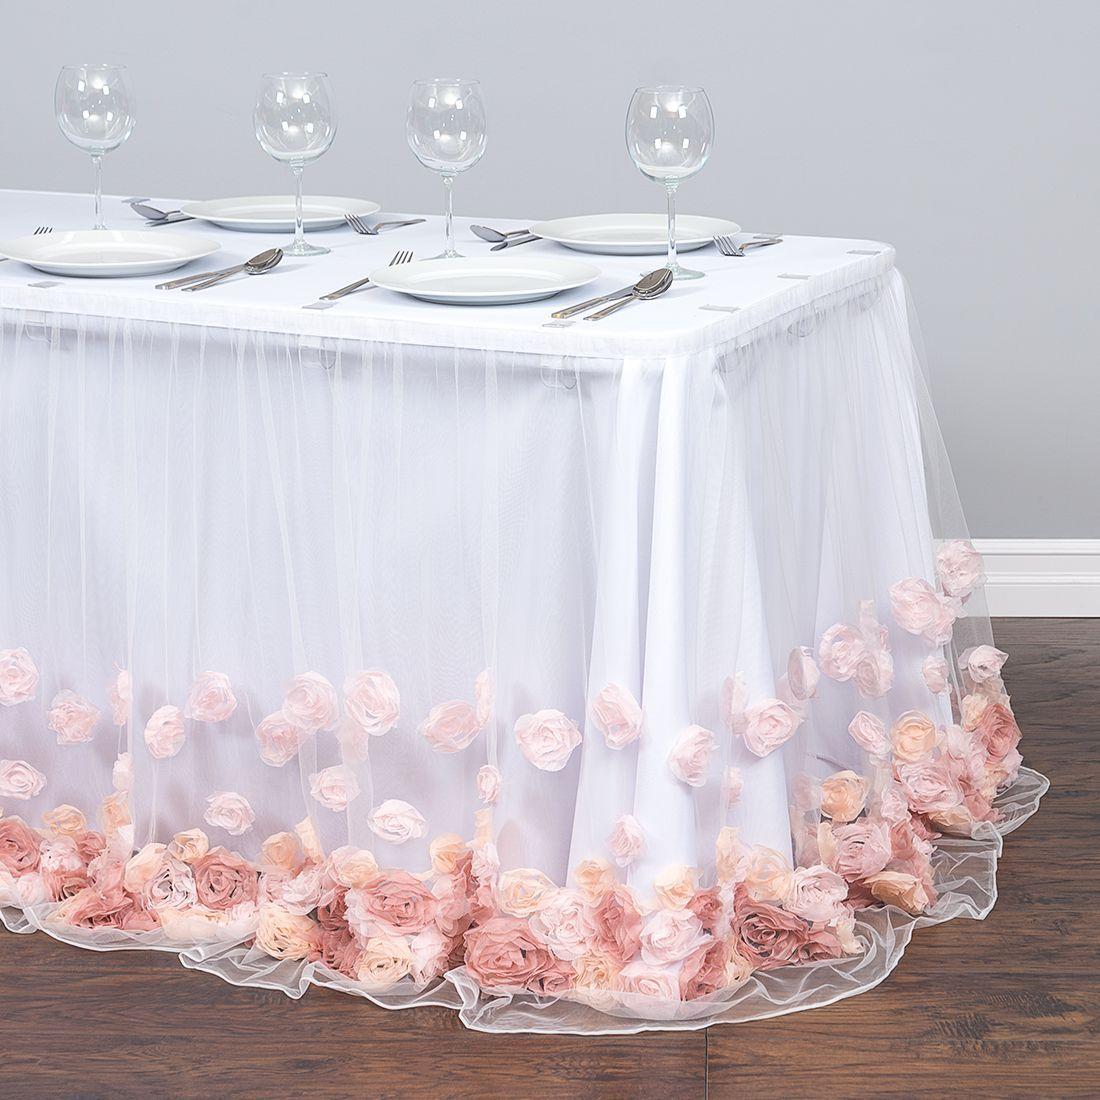 17 Ft Tulle Rose Table Skirt Blush Pink Rose Gold Table Table Skirt Rose Gold Table Cloth